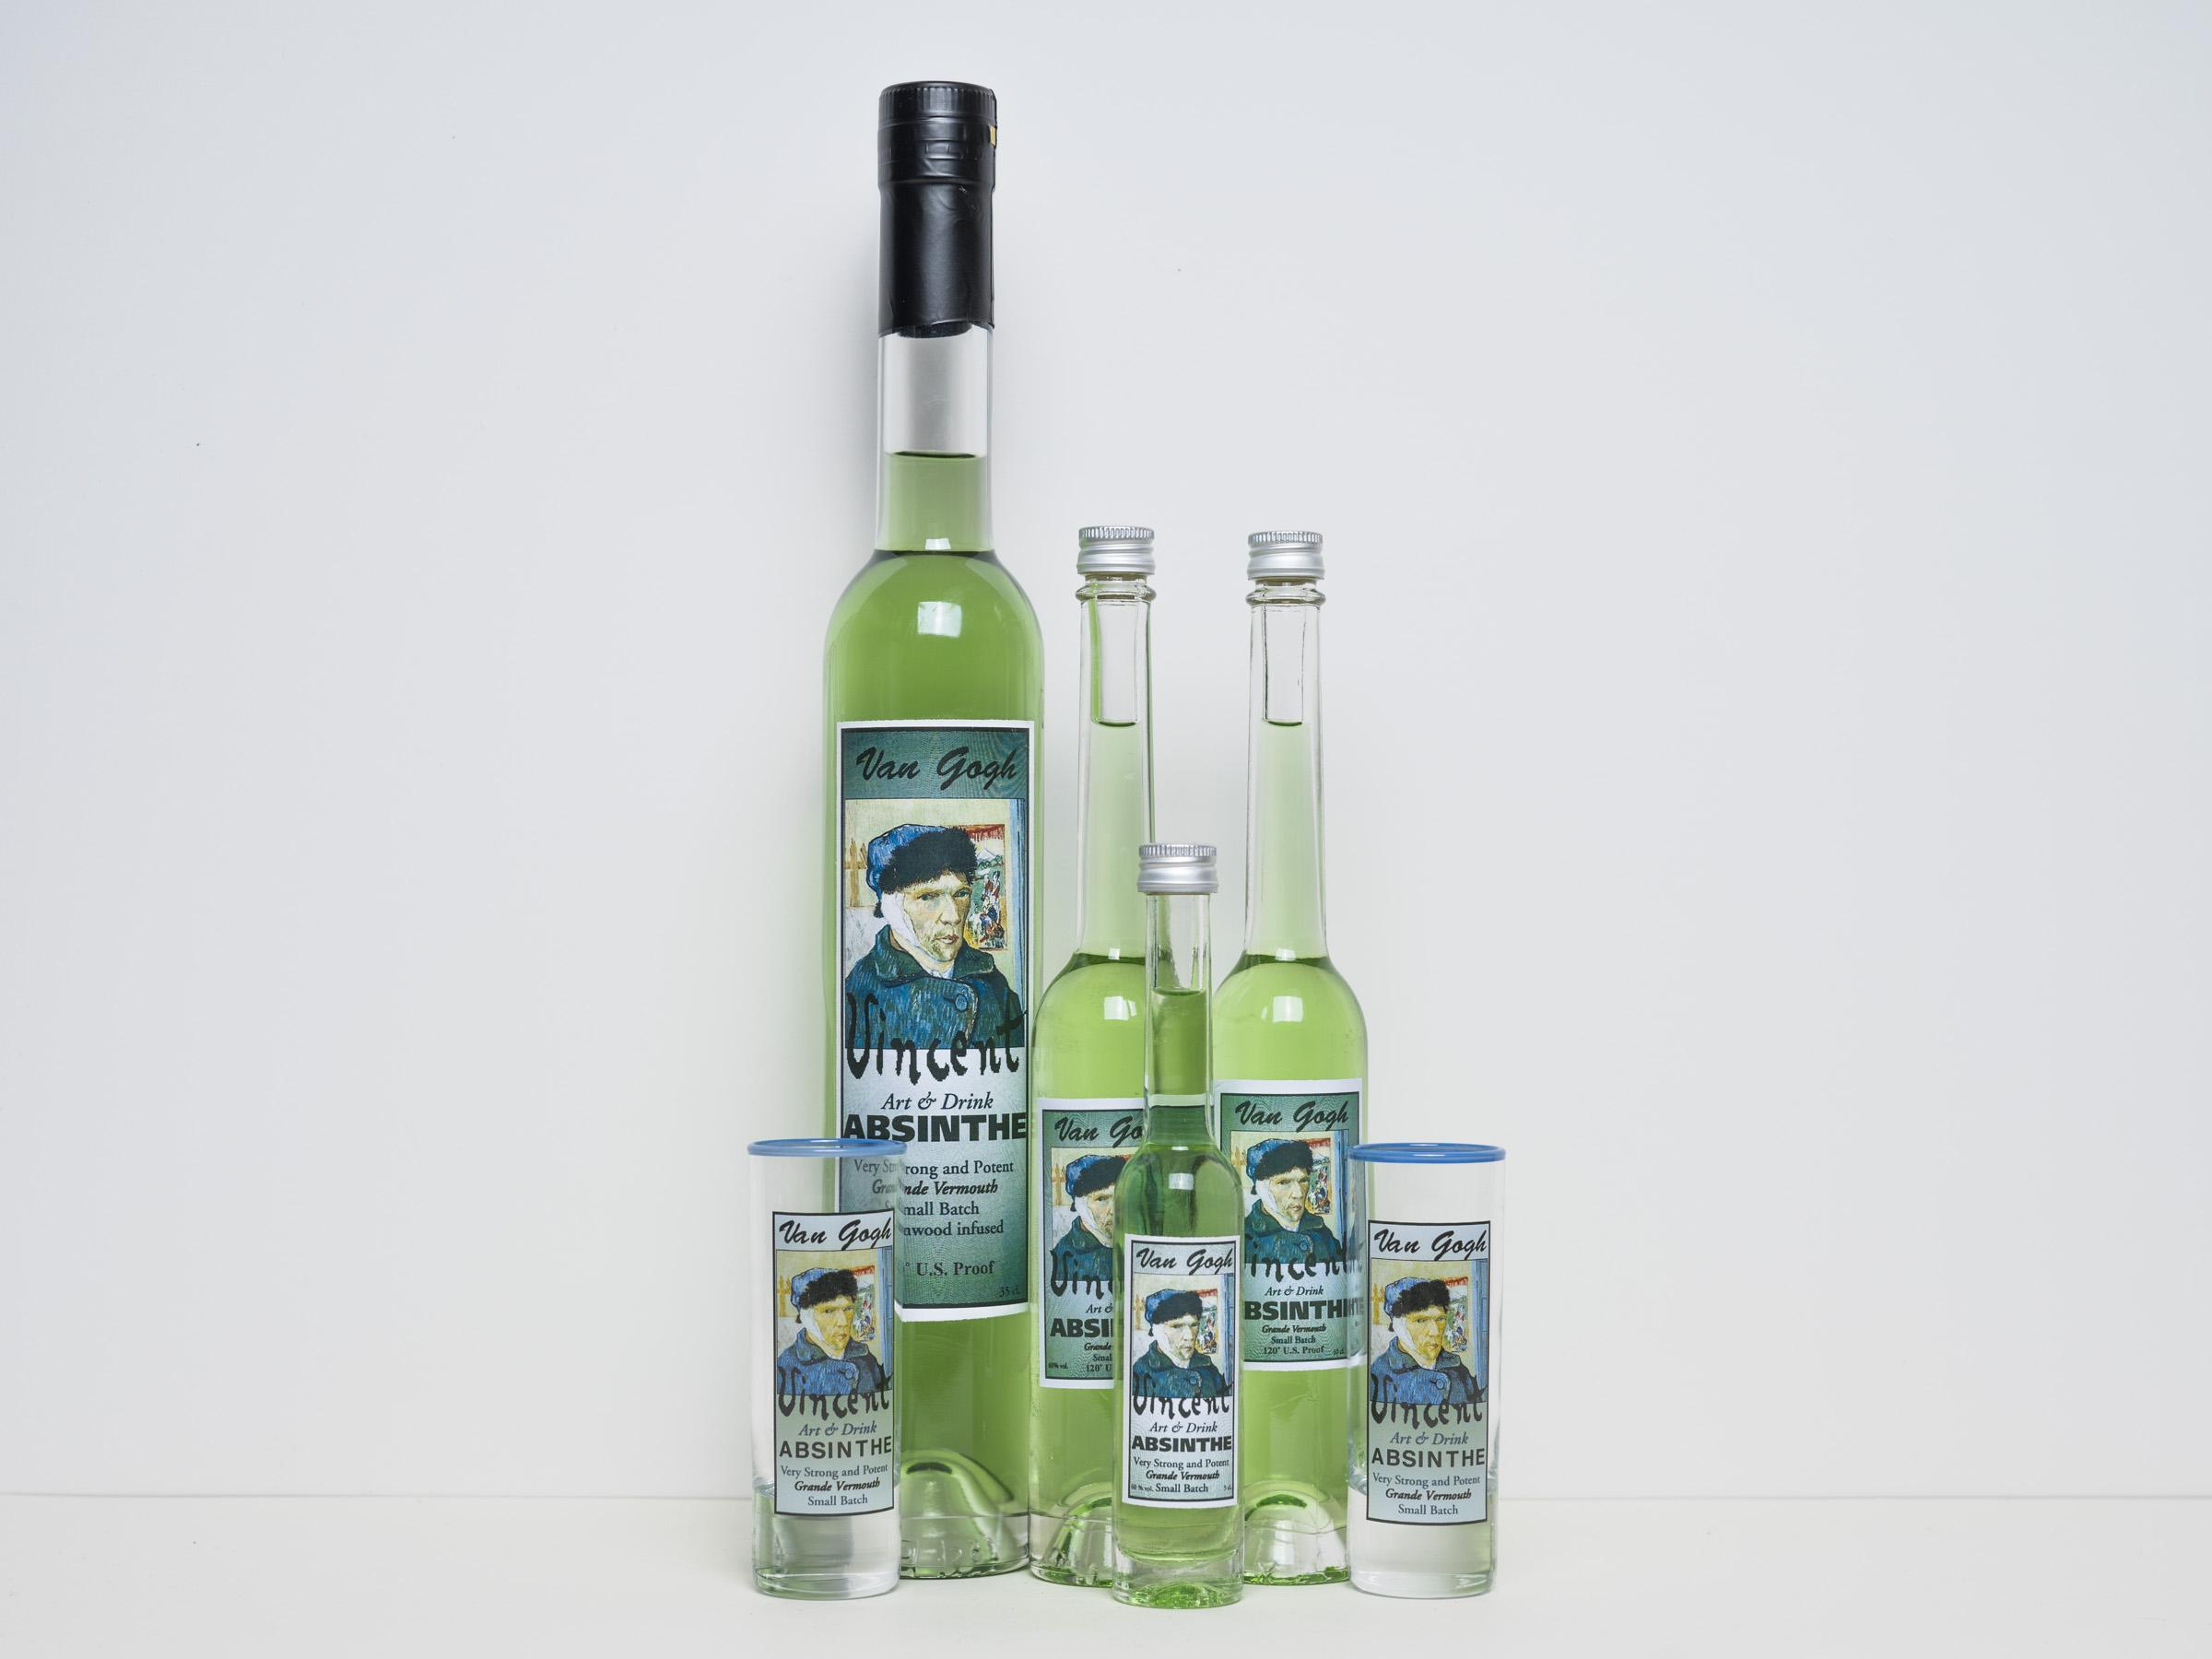 Van gogh absinthe  350ml.  60% vol. alc. en 10 mg. thujone  € 29,95 100ml.  60% vol. alc. en 10 mg. thujone  € 14,95 50ml.  60% vol. alc. en 10 mg. thujone  € 9,95